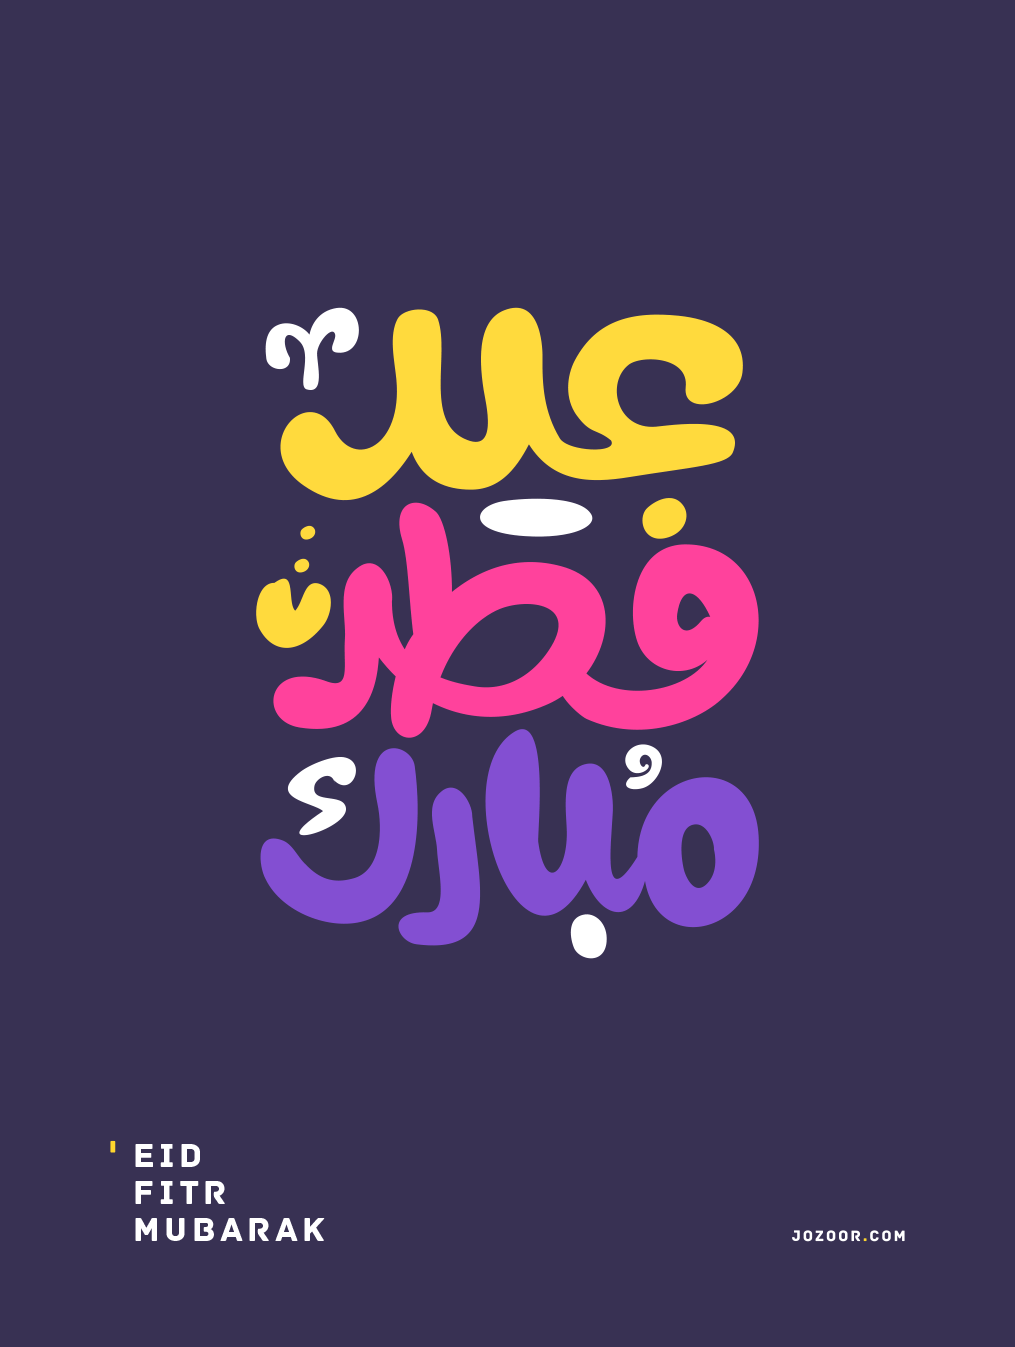 Eid Fitr Mubarak كل عام وأنتم بخير تقبل الله منا ومنكم صالح الأعمال Eid Mubarak Images Eid Mubarak Eid Greetings